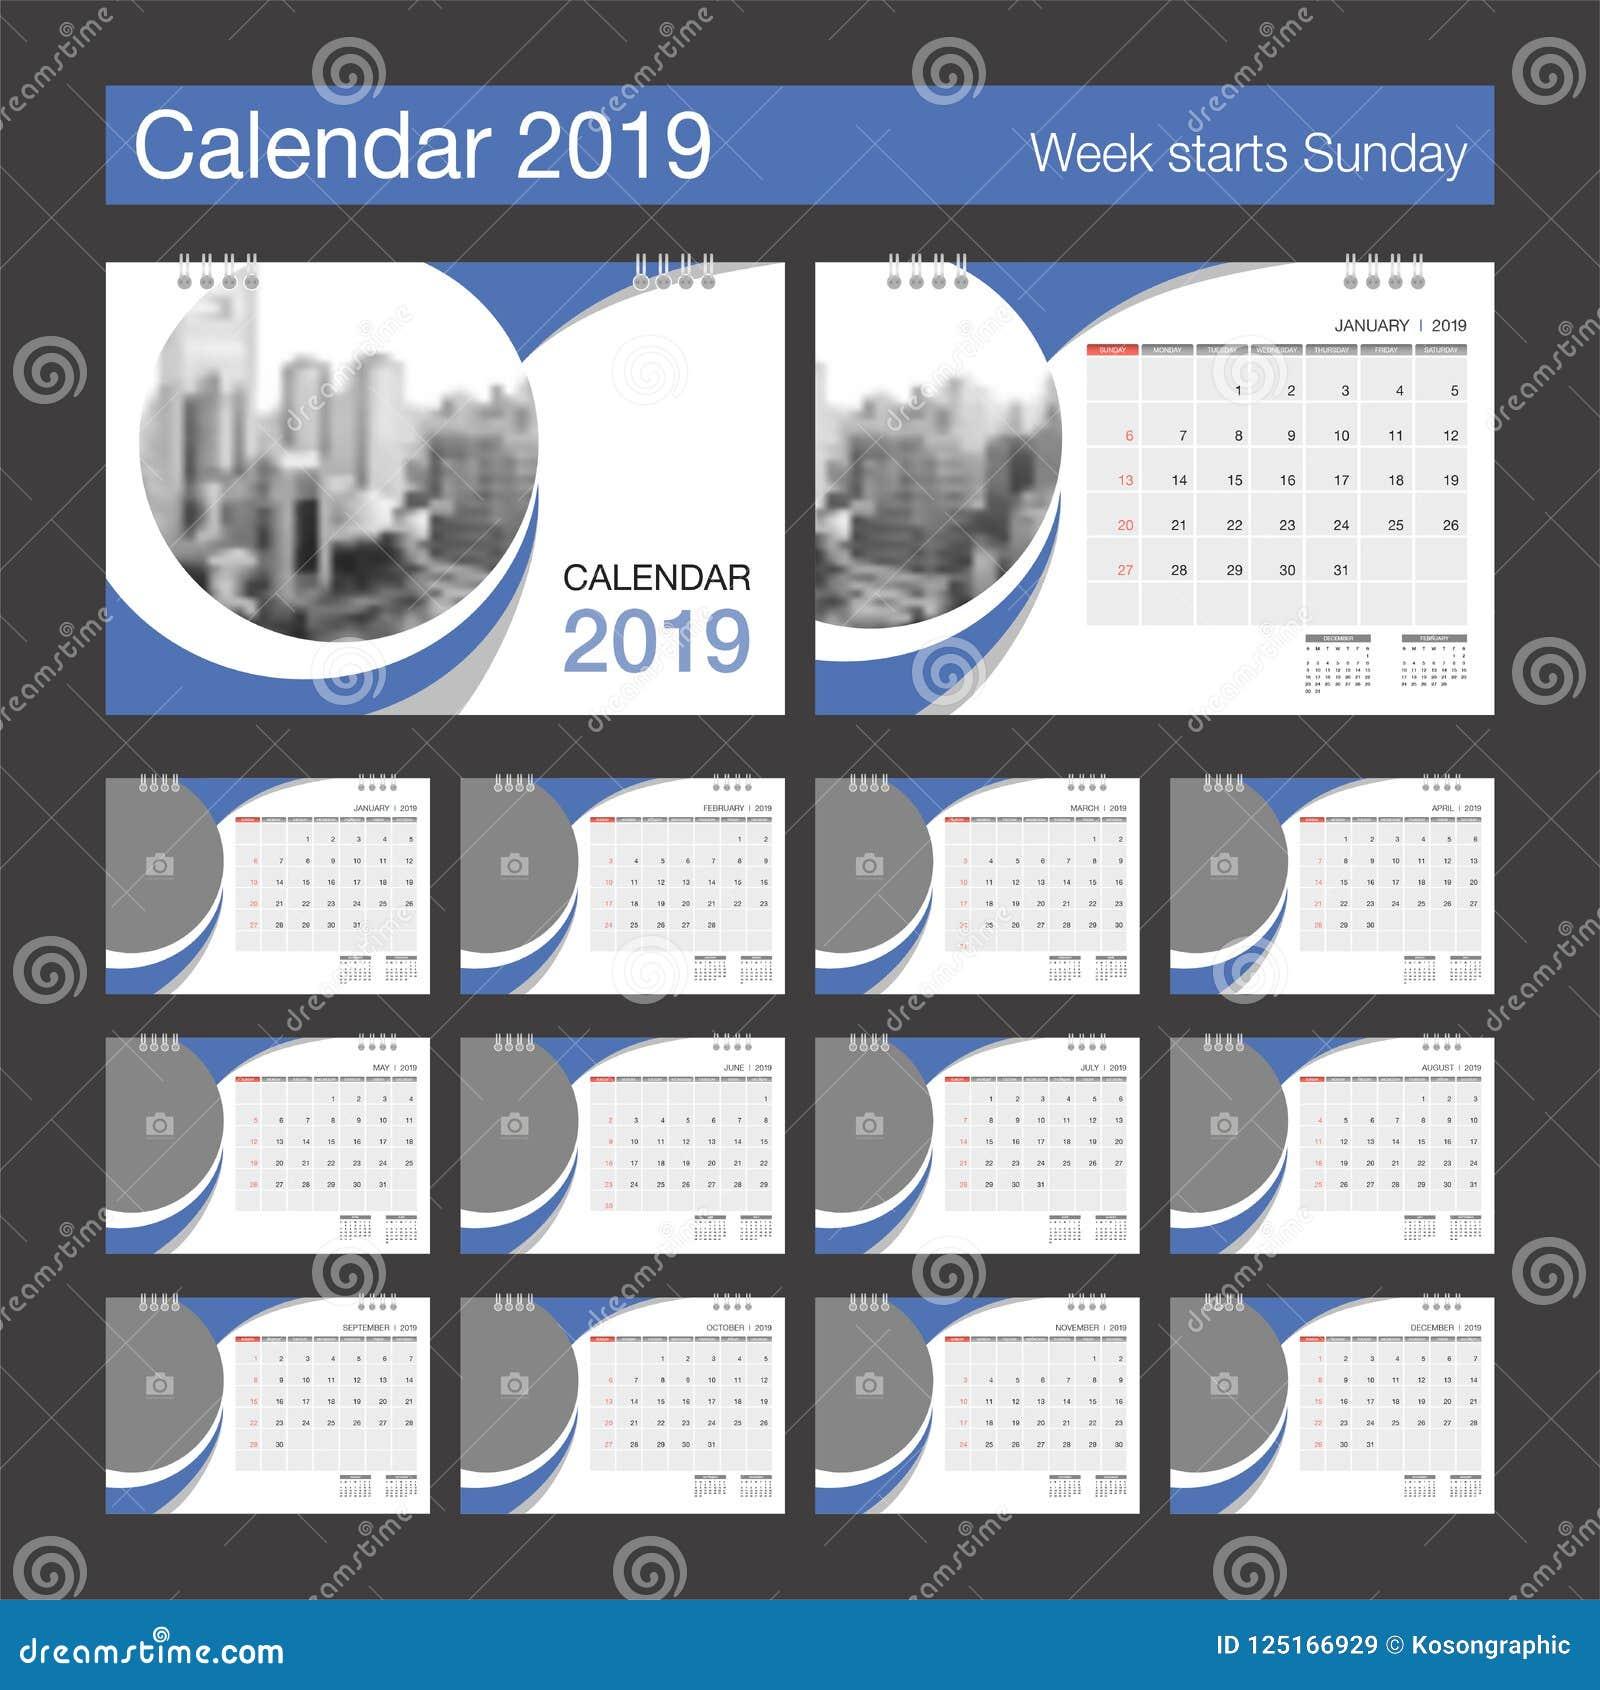 Calendario F.Calendario 2019 Plantilla Del Diseno Moderno Del Calendario